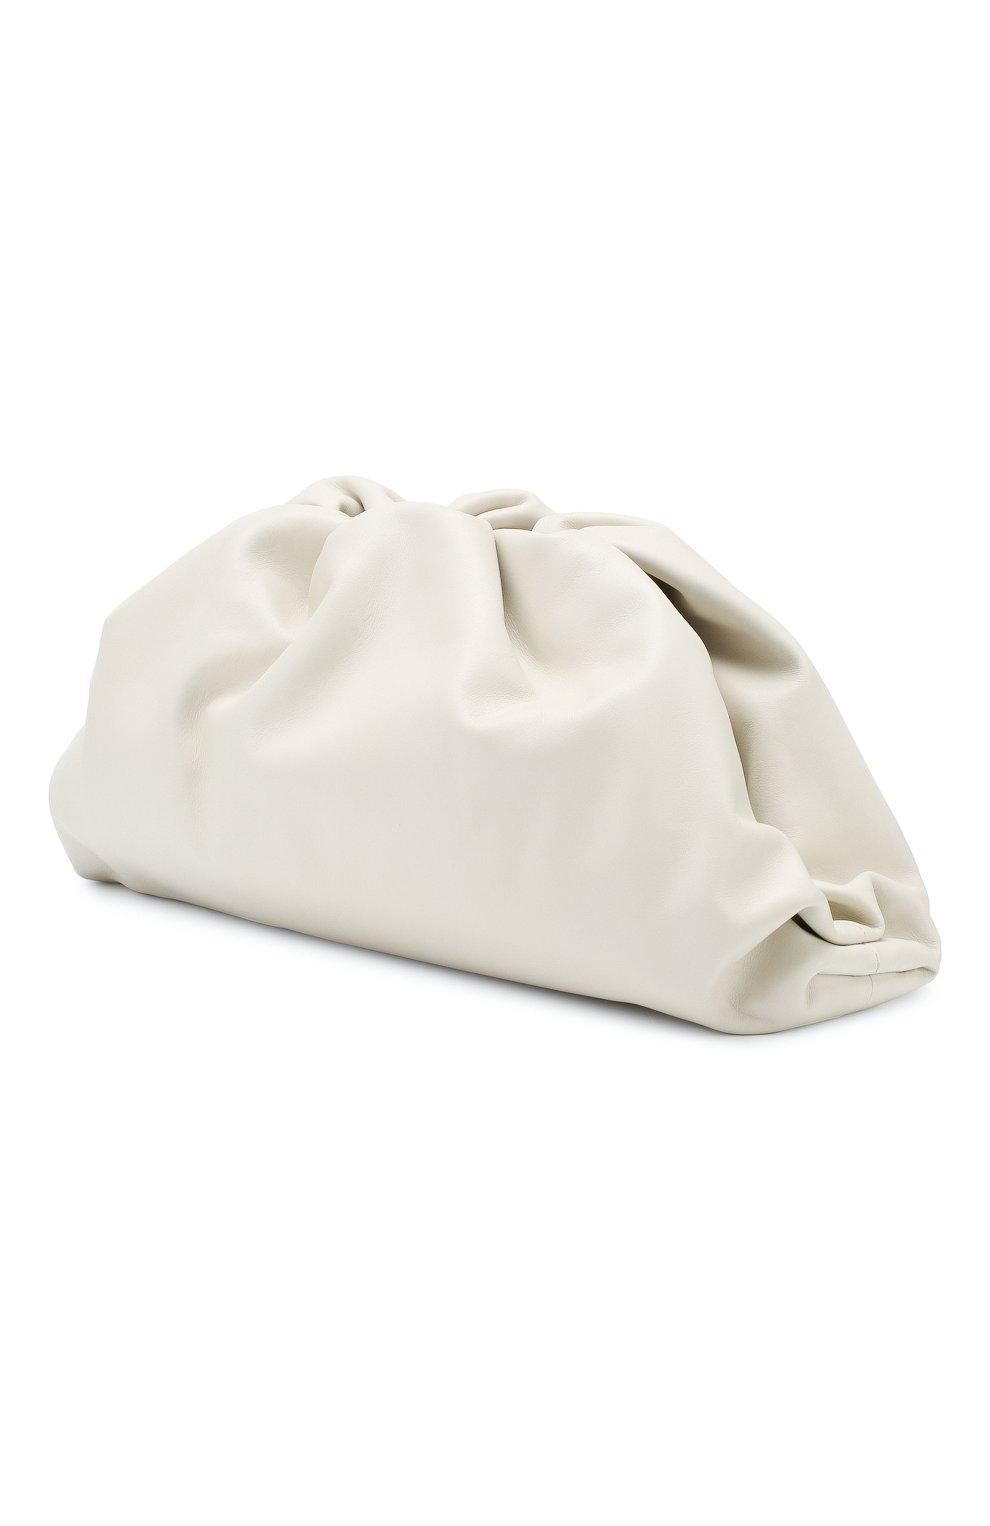 Женский клатч pouch BOTTEGA VENETA белого цвета, арт. 576227/VCP40   Фото 3